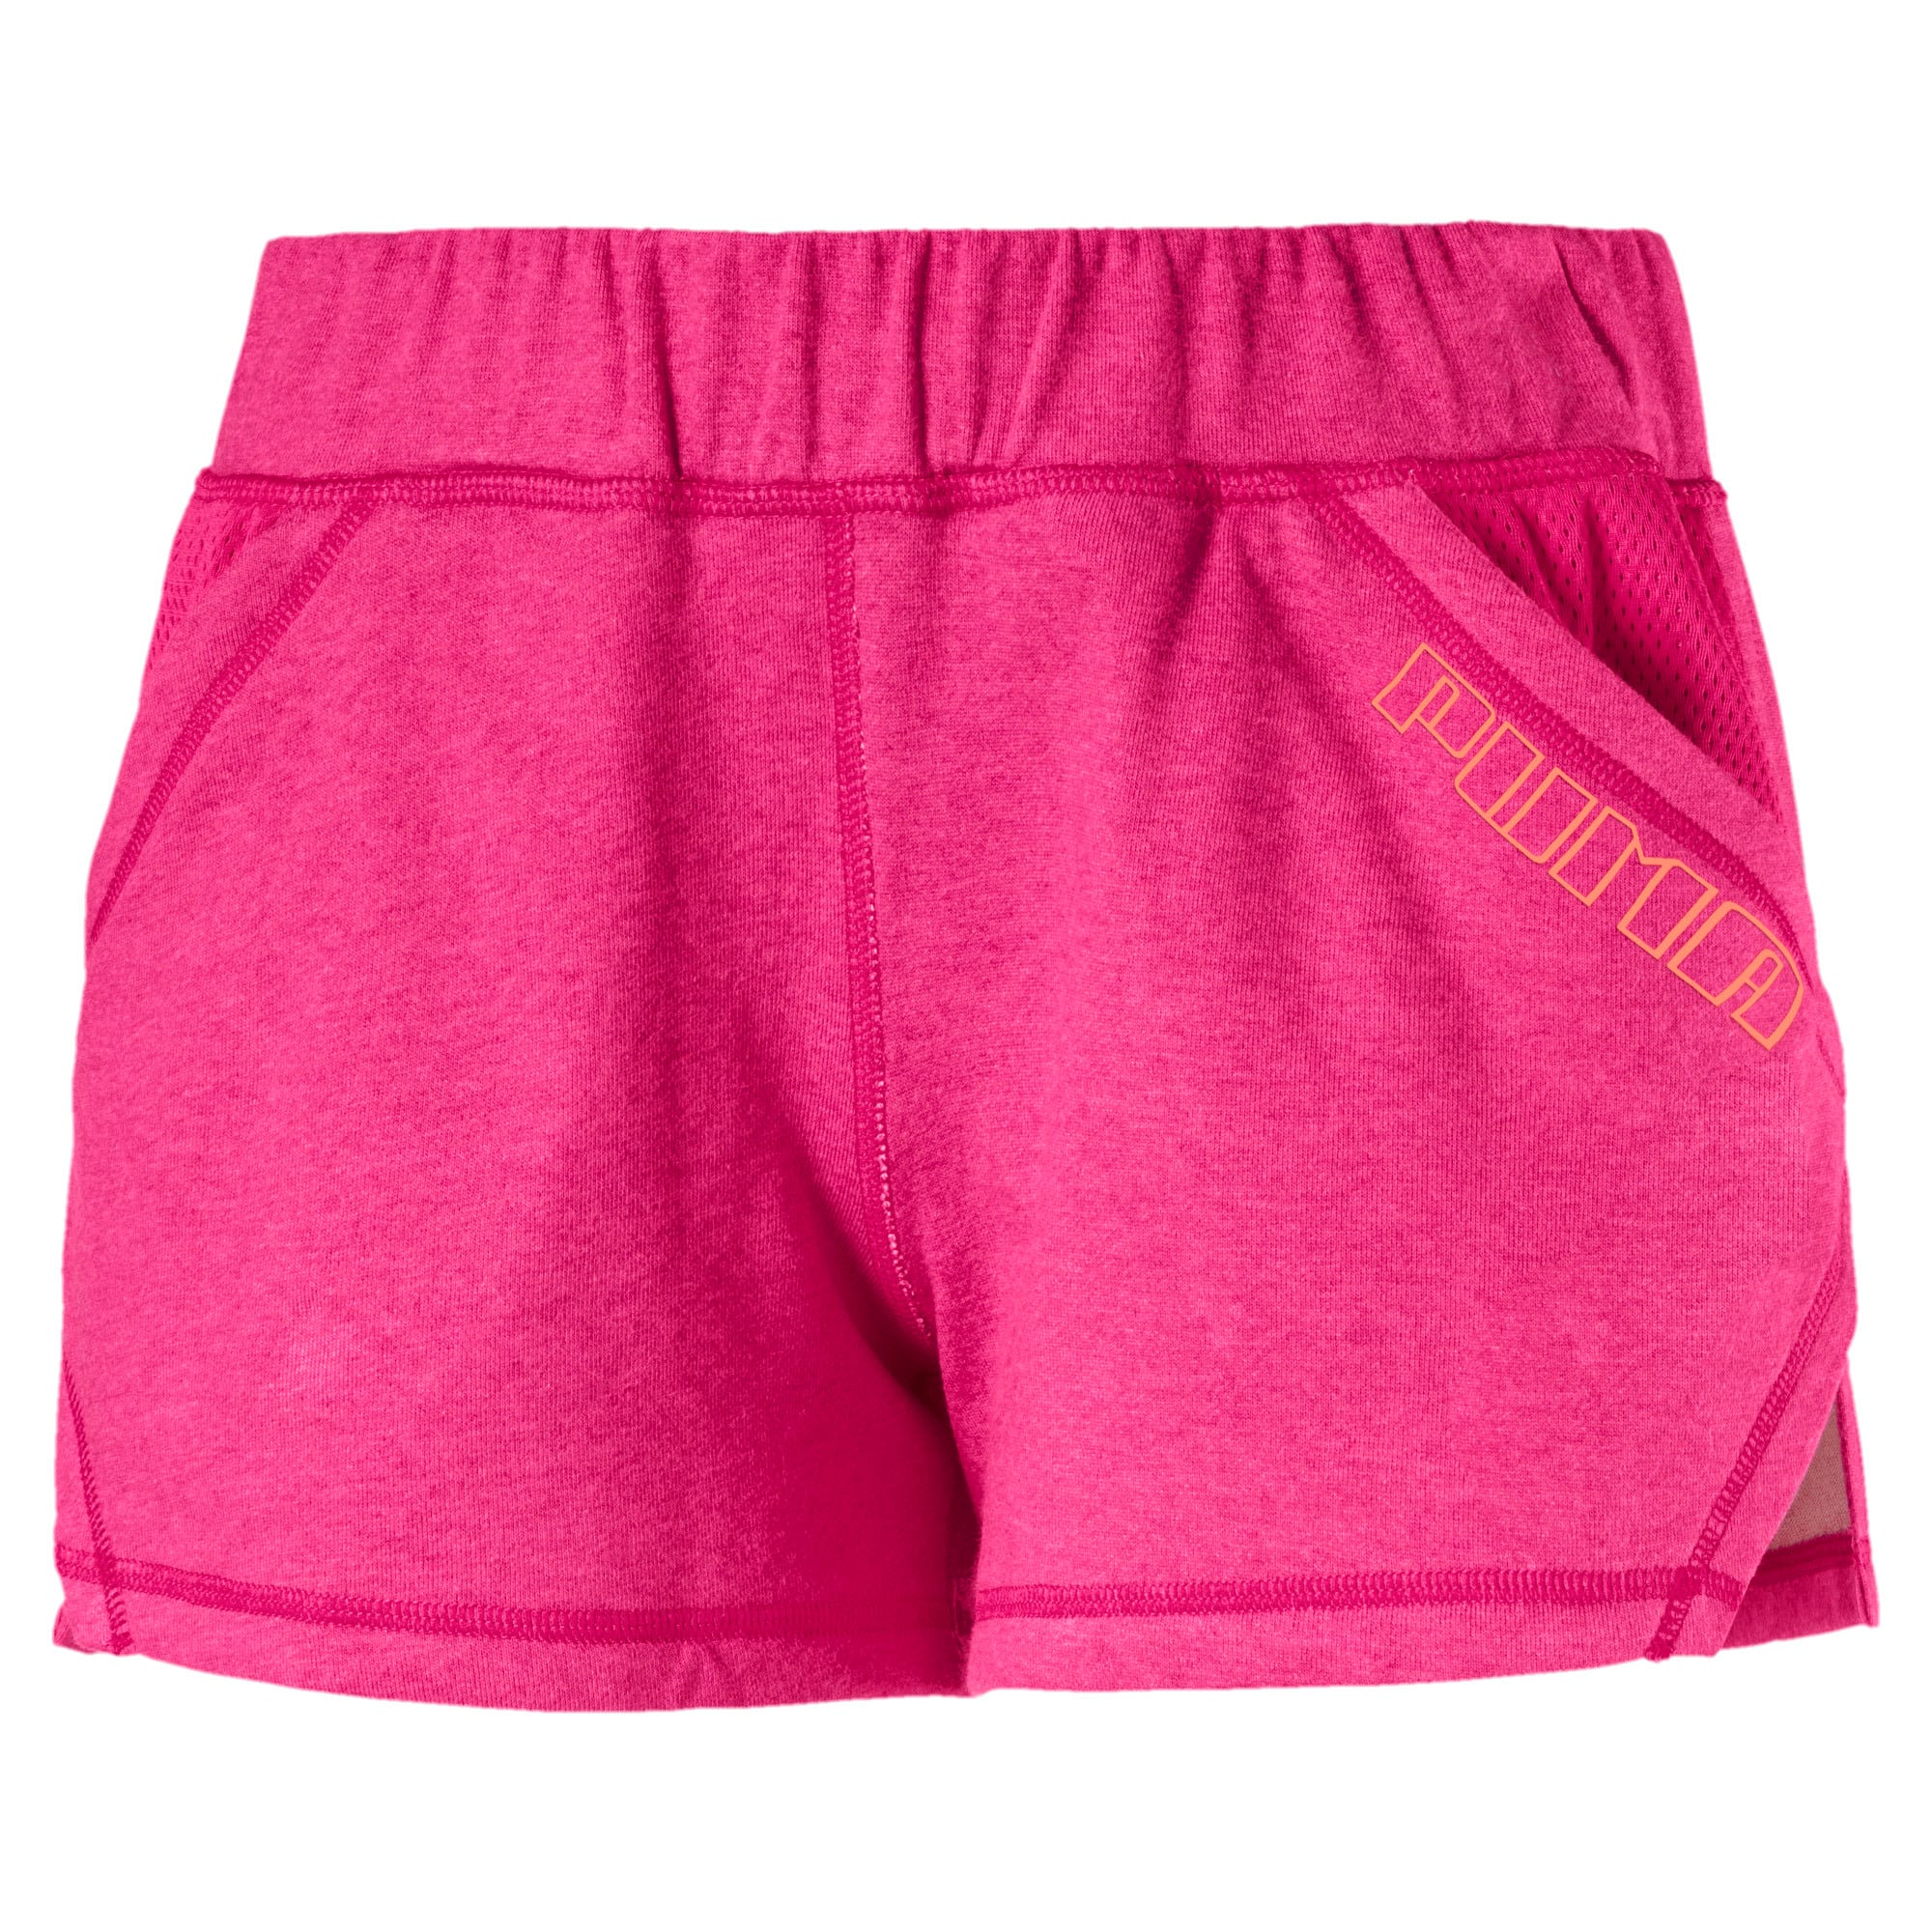 "Thumbnail 4 of A.C.E. Yogini 3"" Women's Training Shorts, Fuchsia Purple Heather, medium"